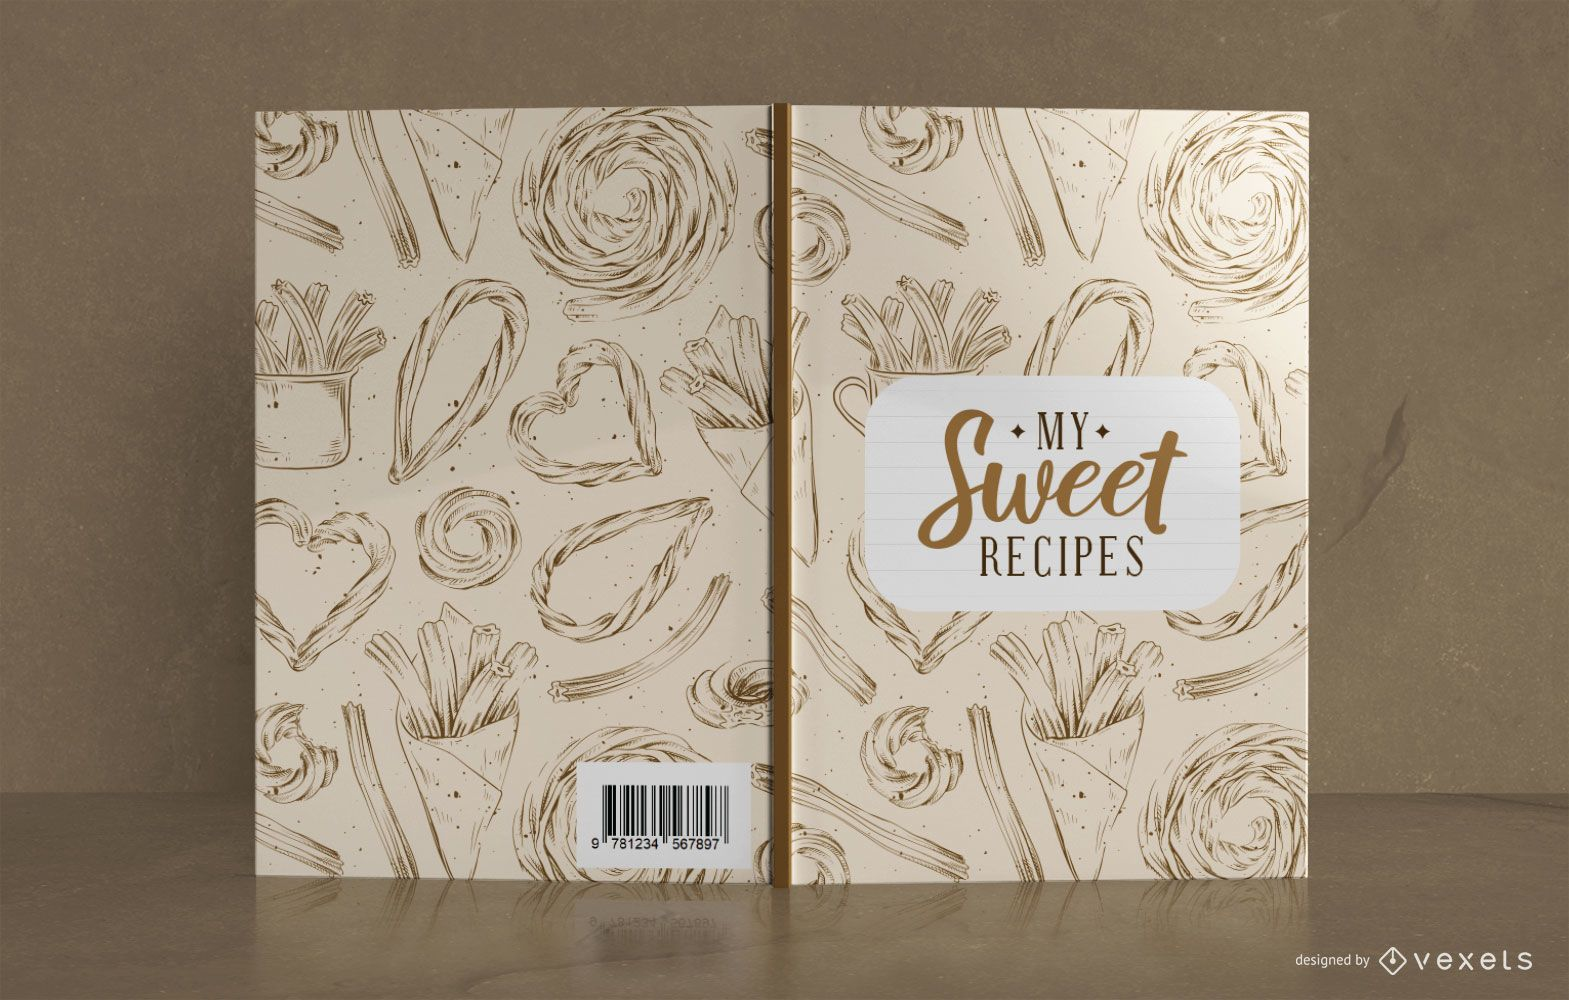 Sweet Recipe Book Cover Design